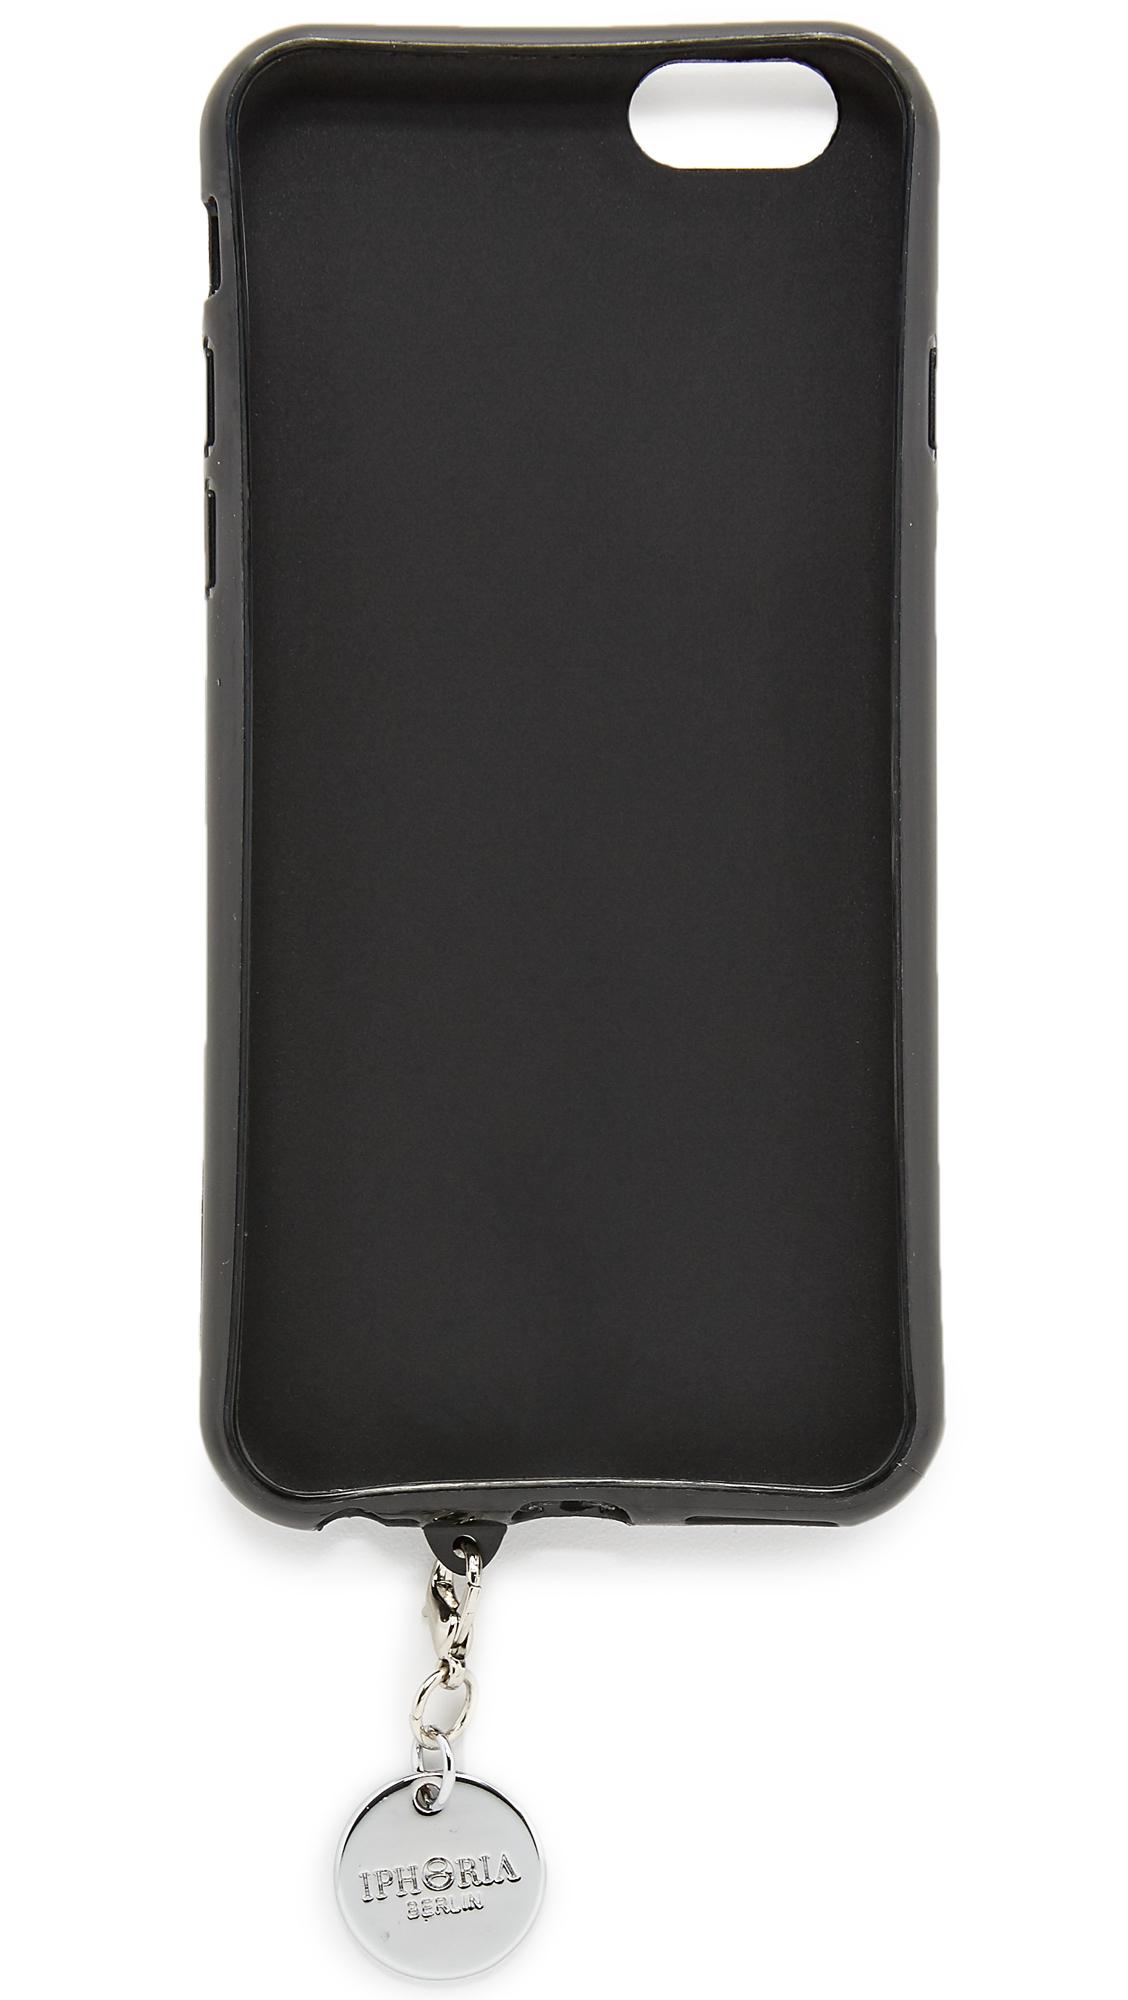 iphoria black snakeskin monster iphone 6 6s case in pink. Black Bedroom Furniture Sets. Home Design Ideas